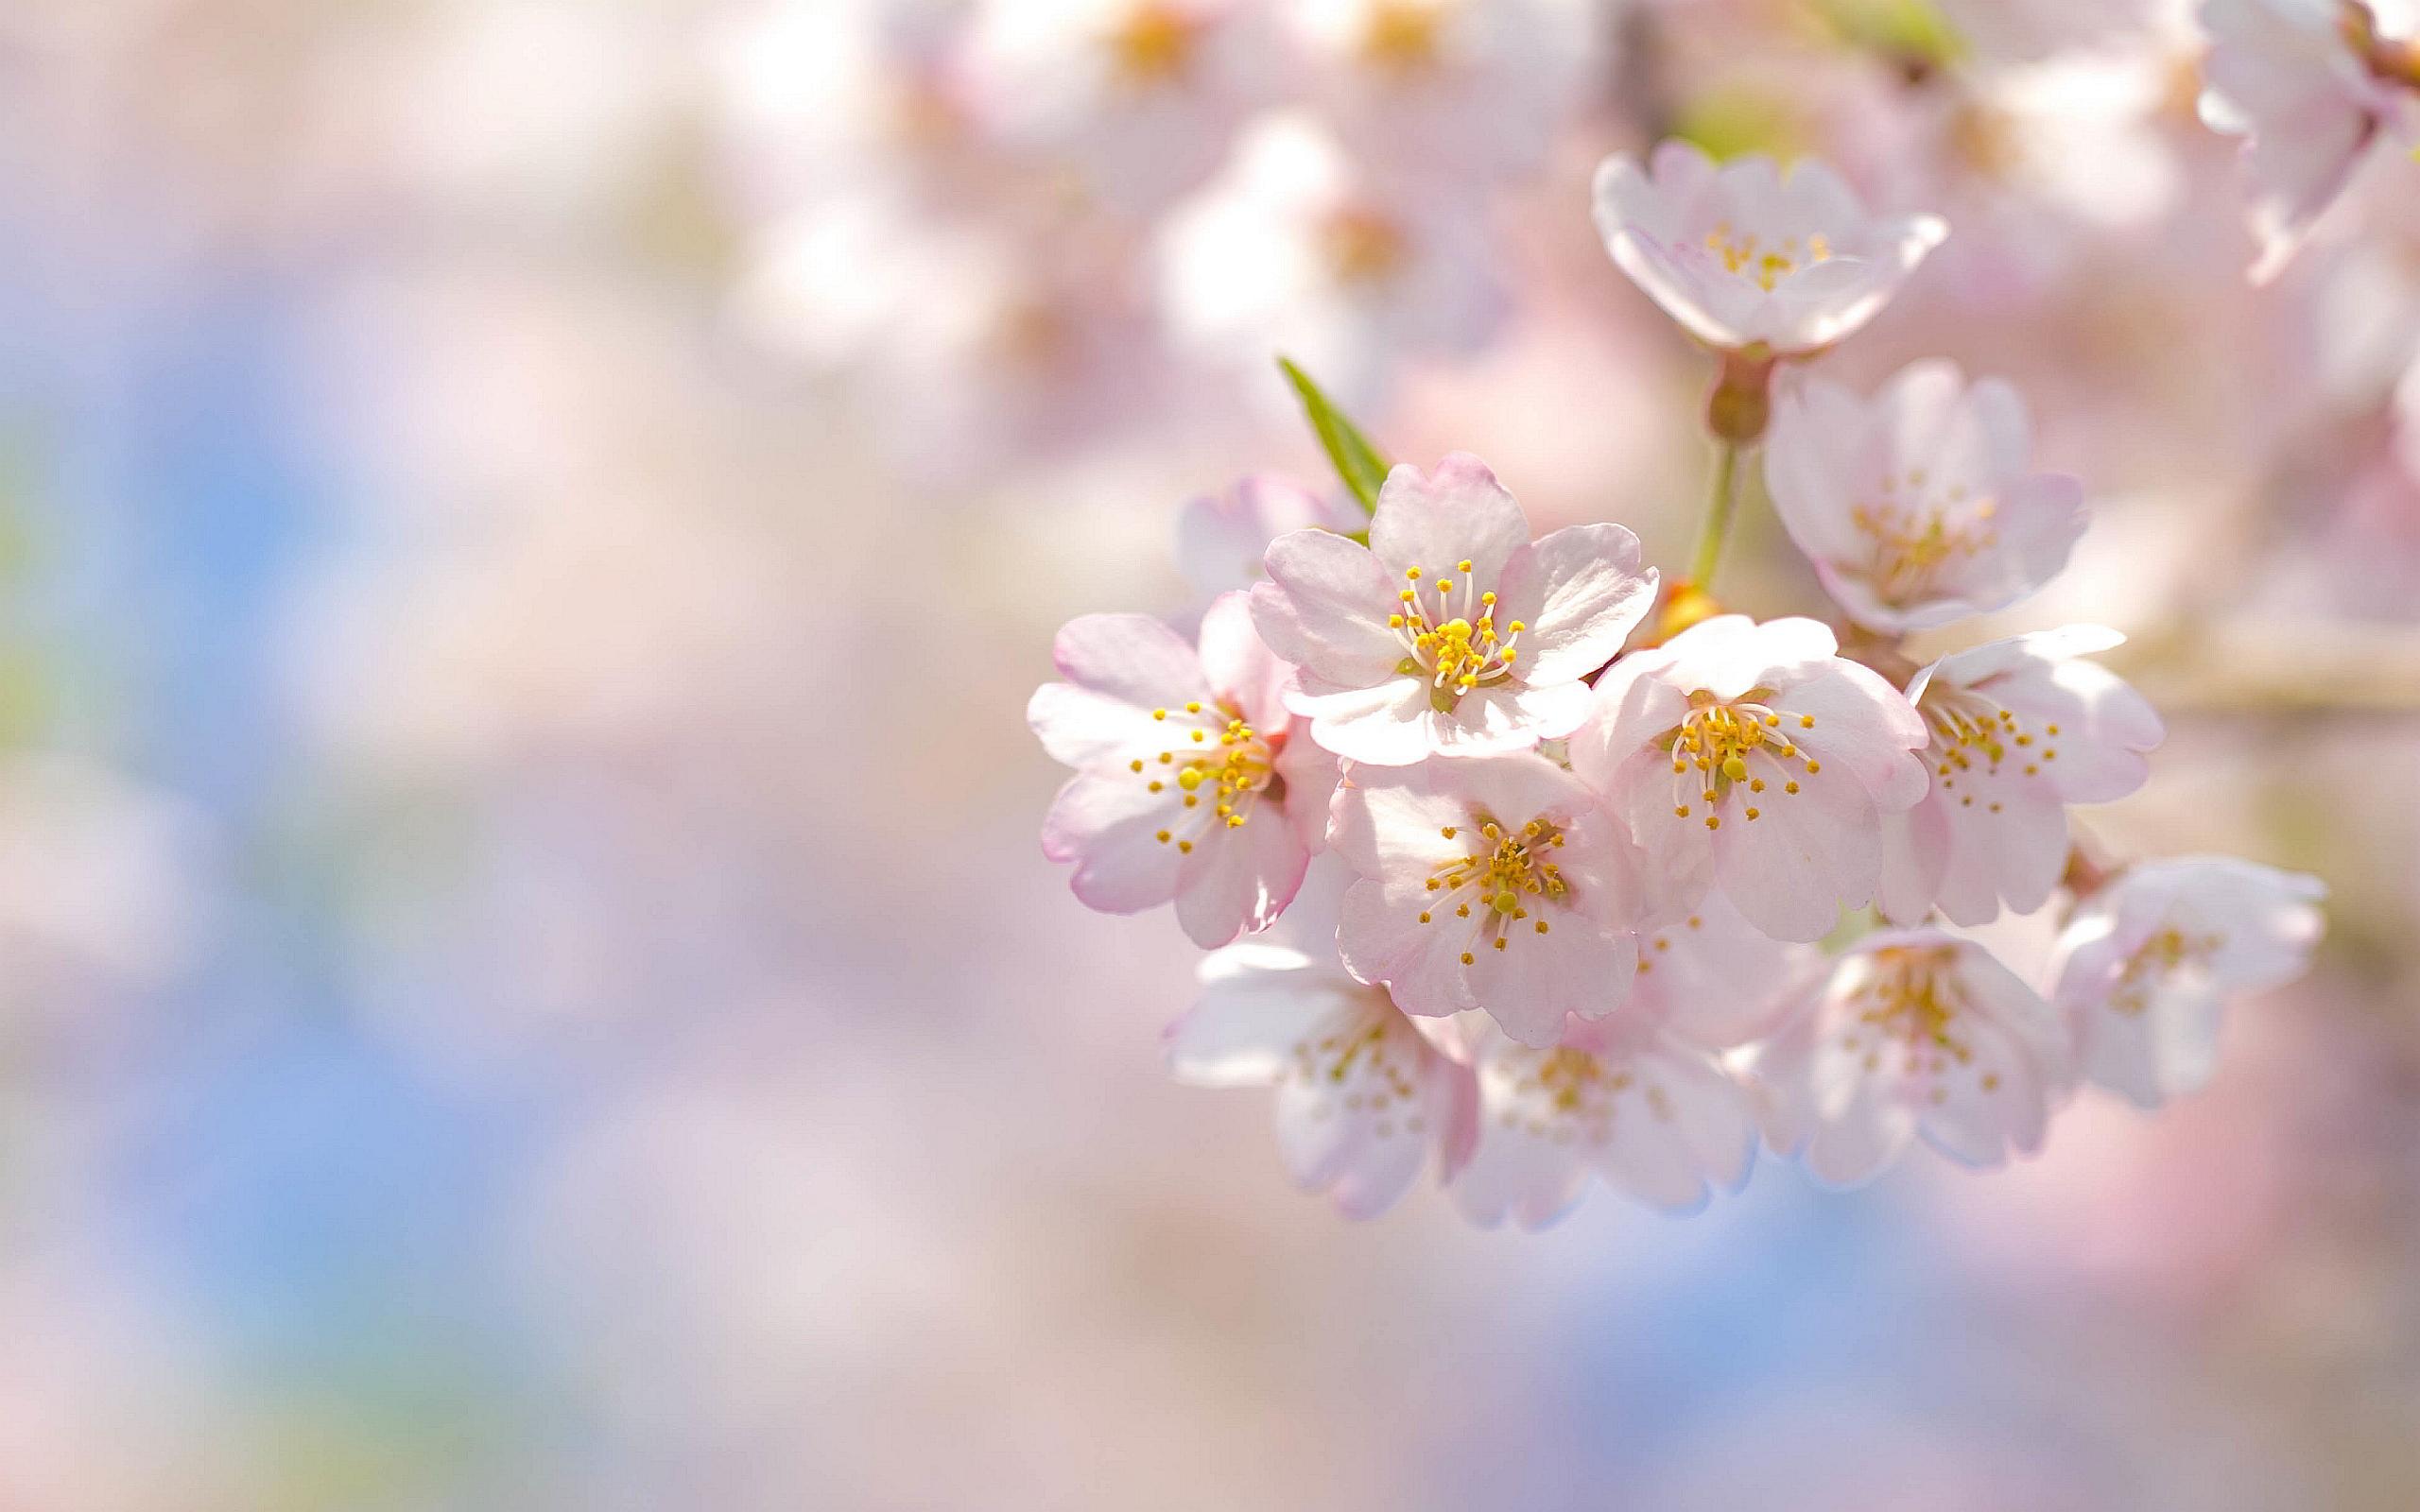 Spring sakura cherry